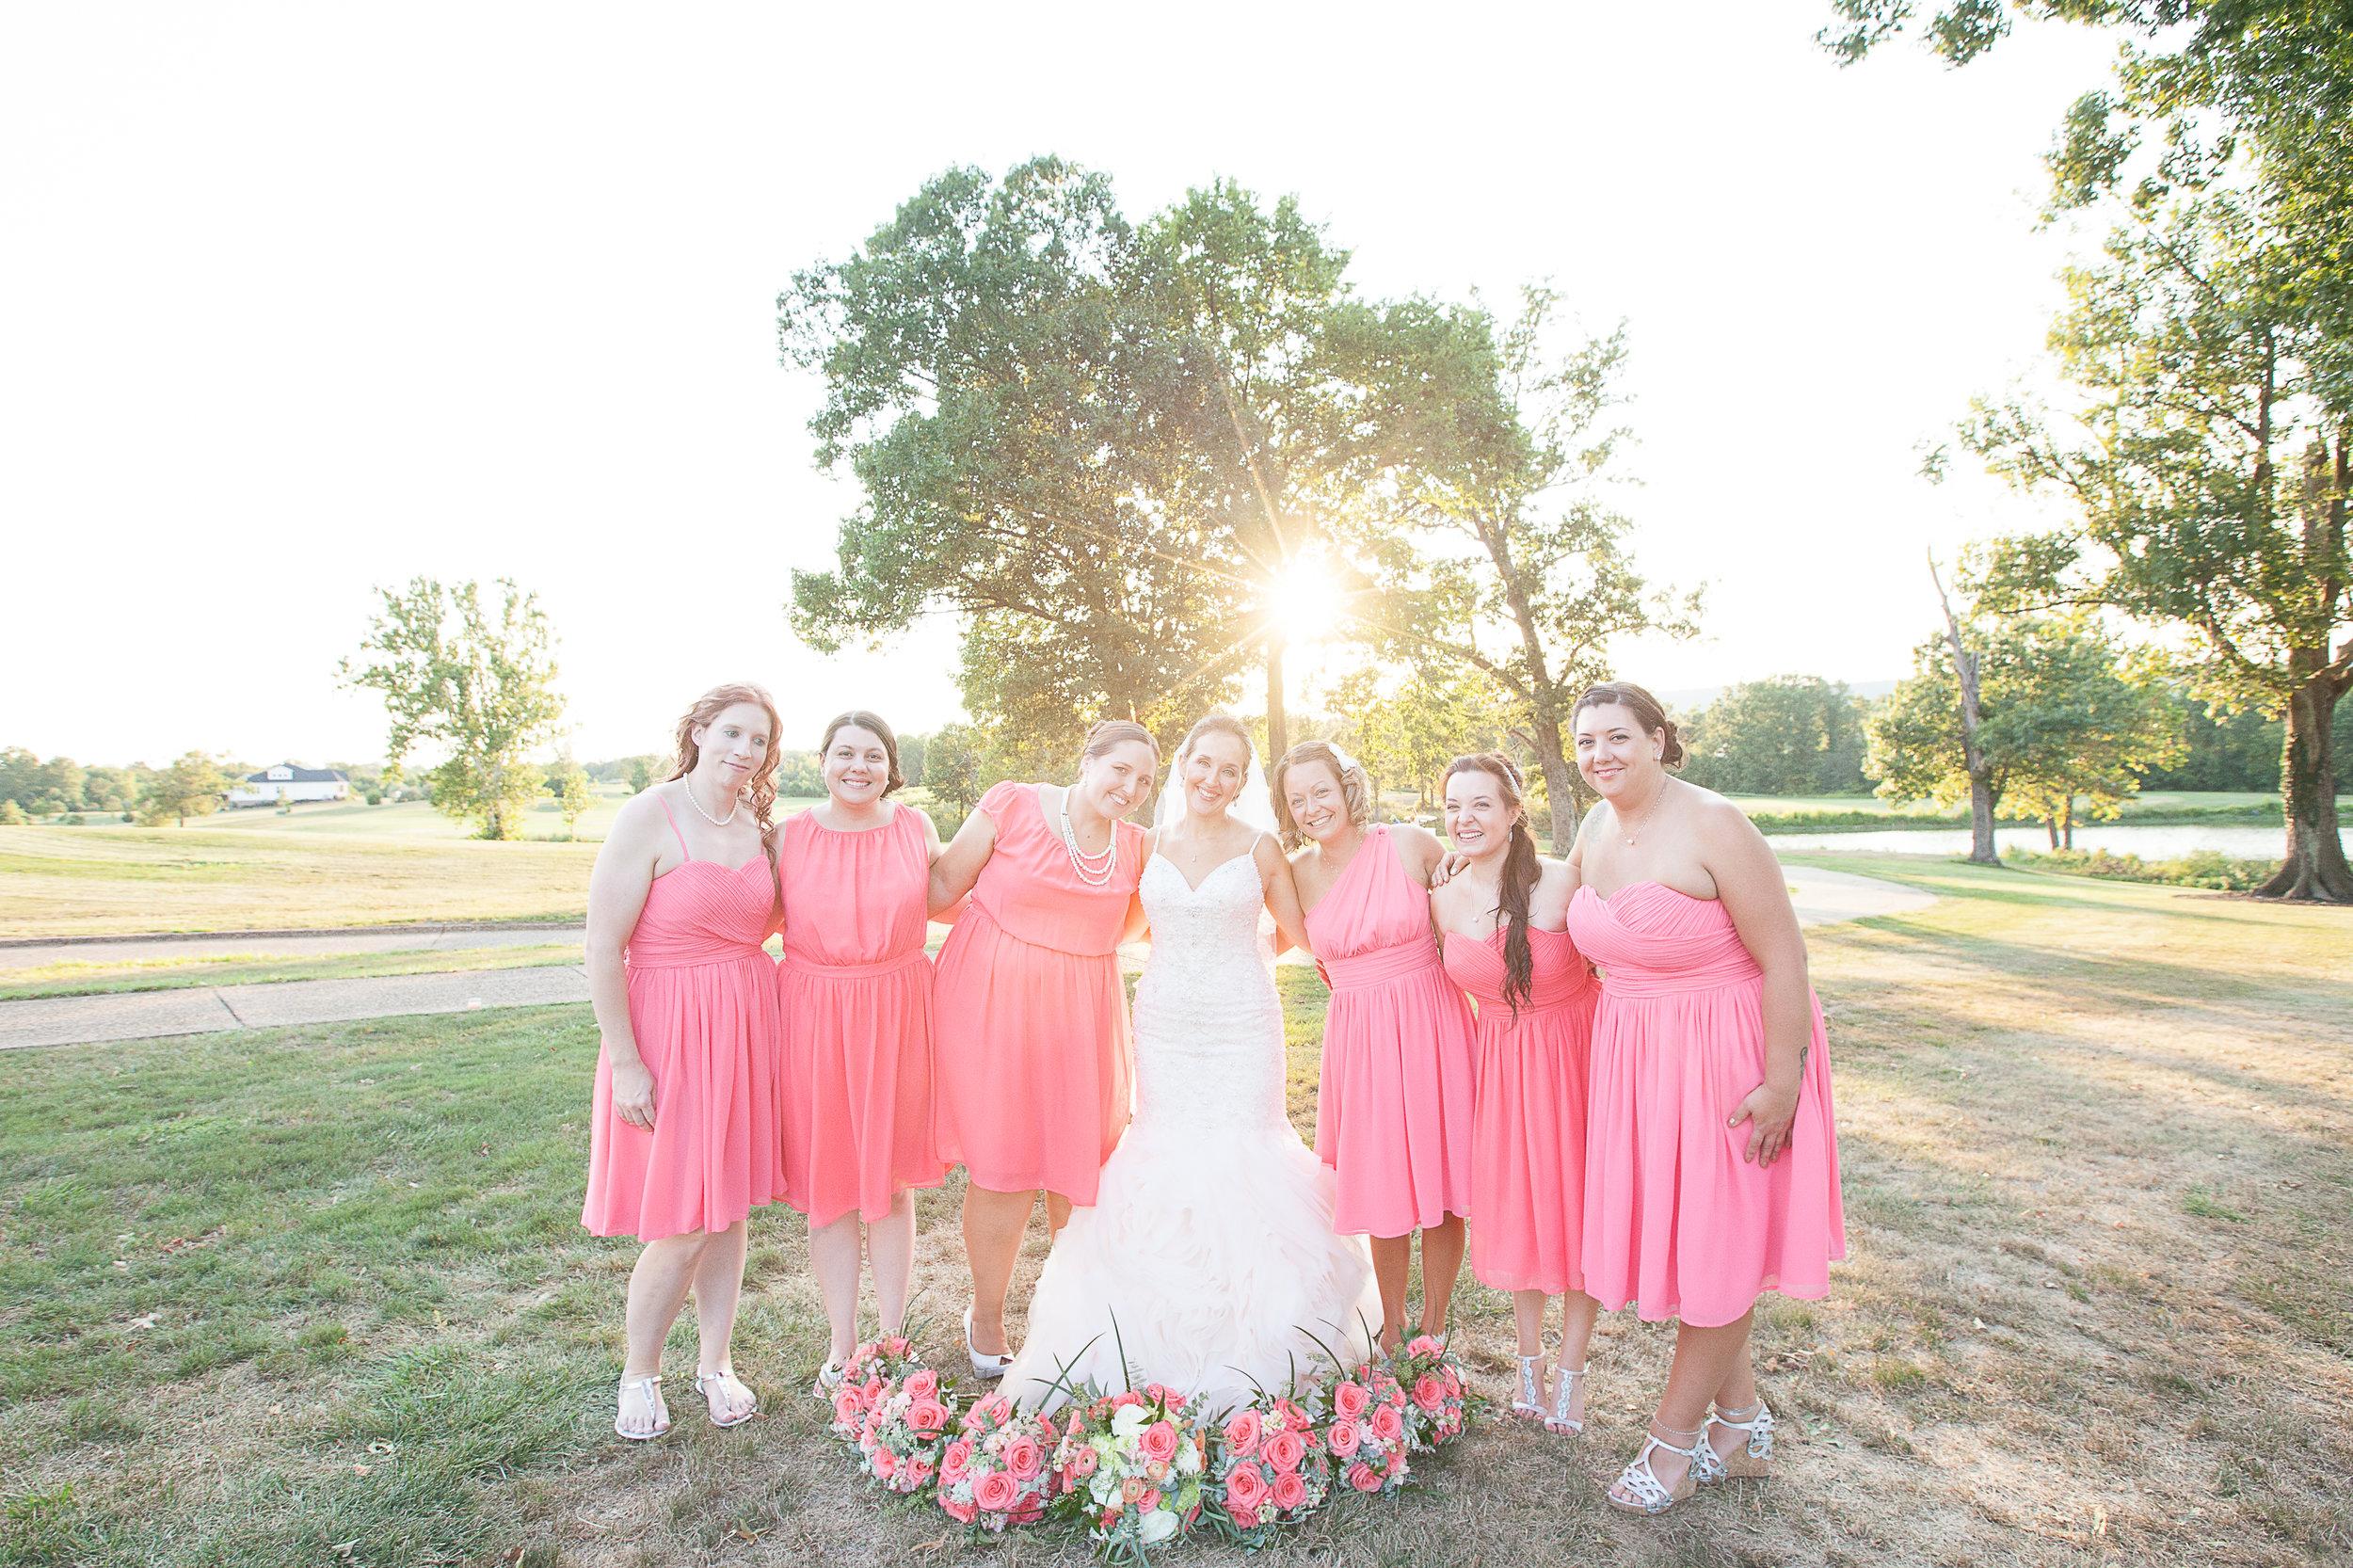 Marissa-Timon-Wedding-Kim-Pham-Clark-Photography-10.jpg